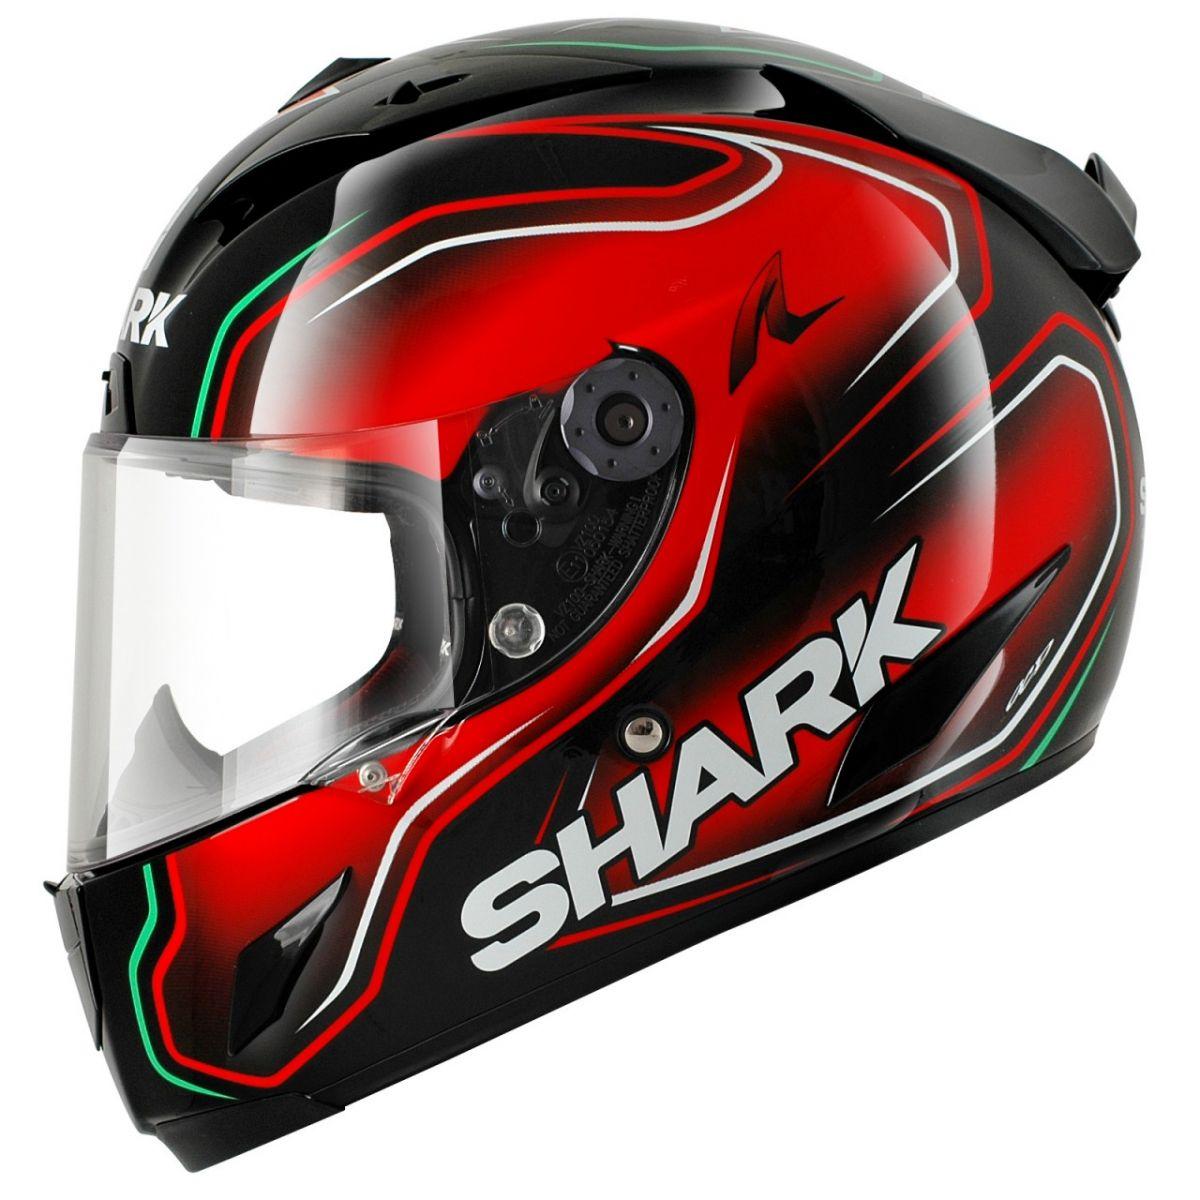 Capacete Shark Race-R PRO Carbon Division Replica Guintoli KRG  - Super Bike - Loja Oficial Alpinestars